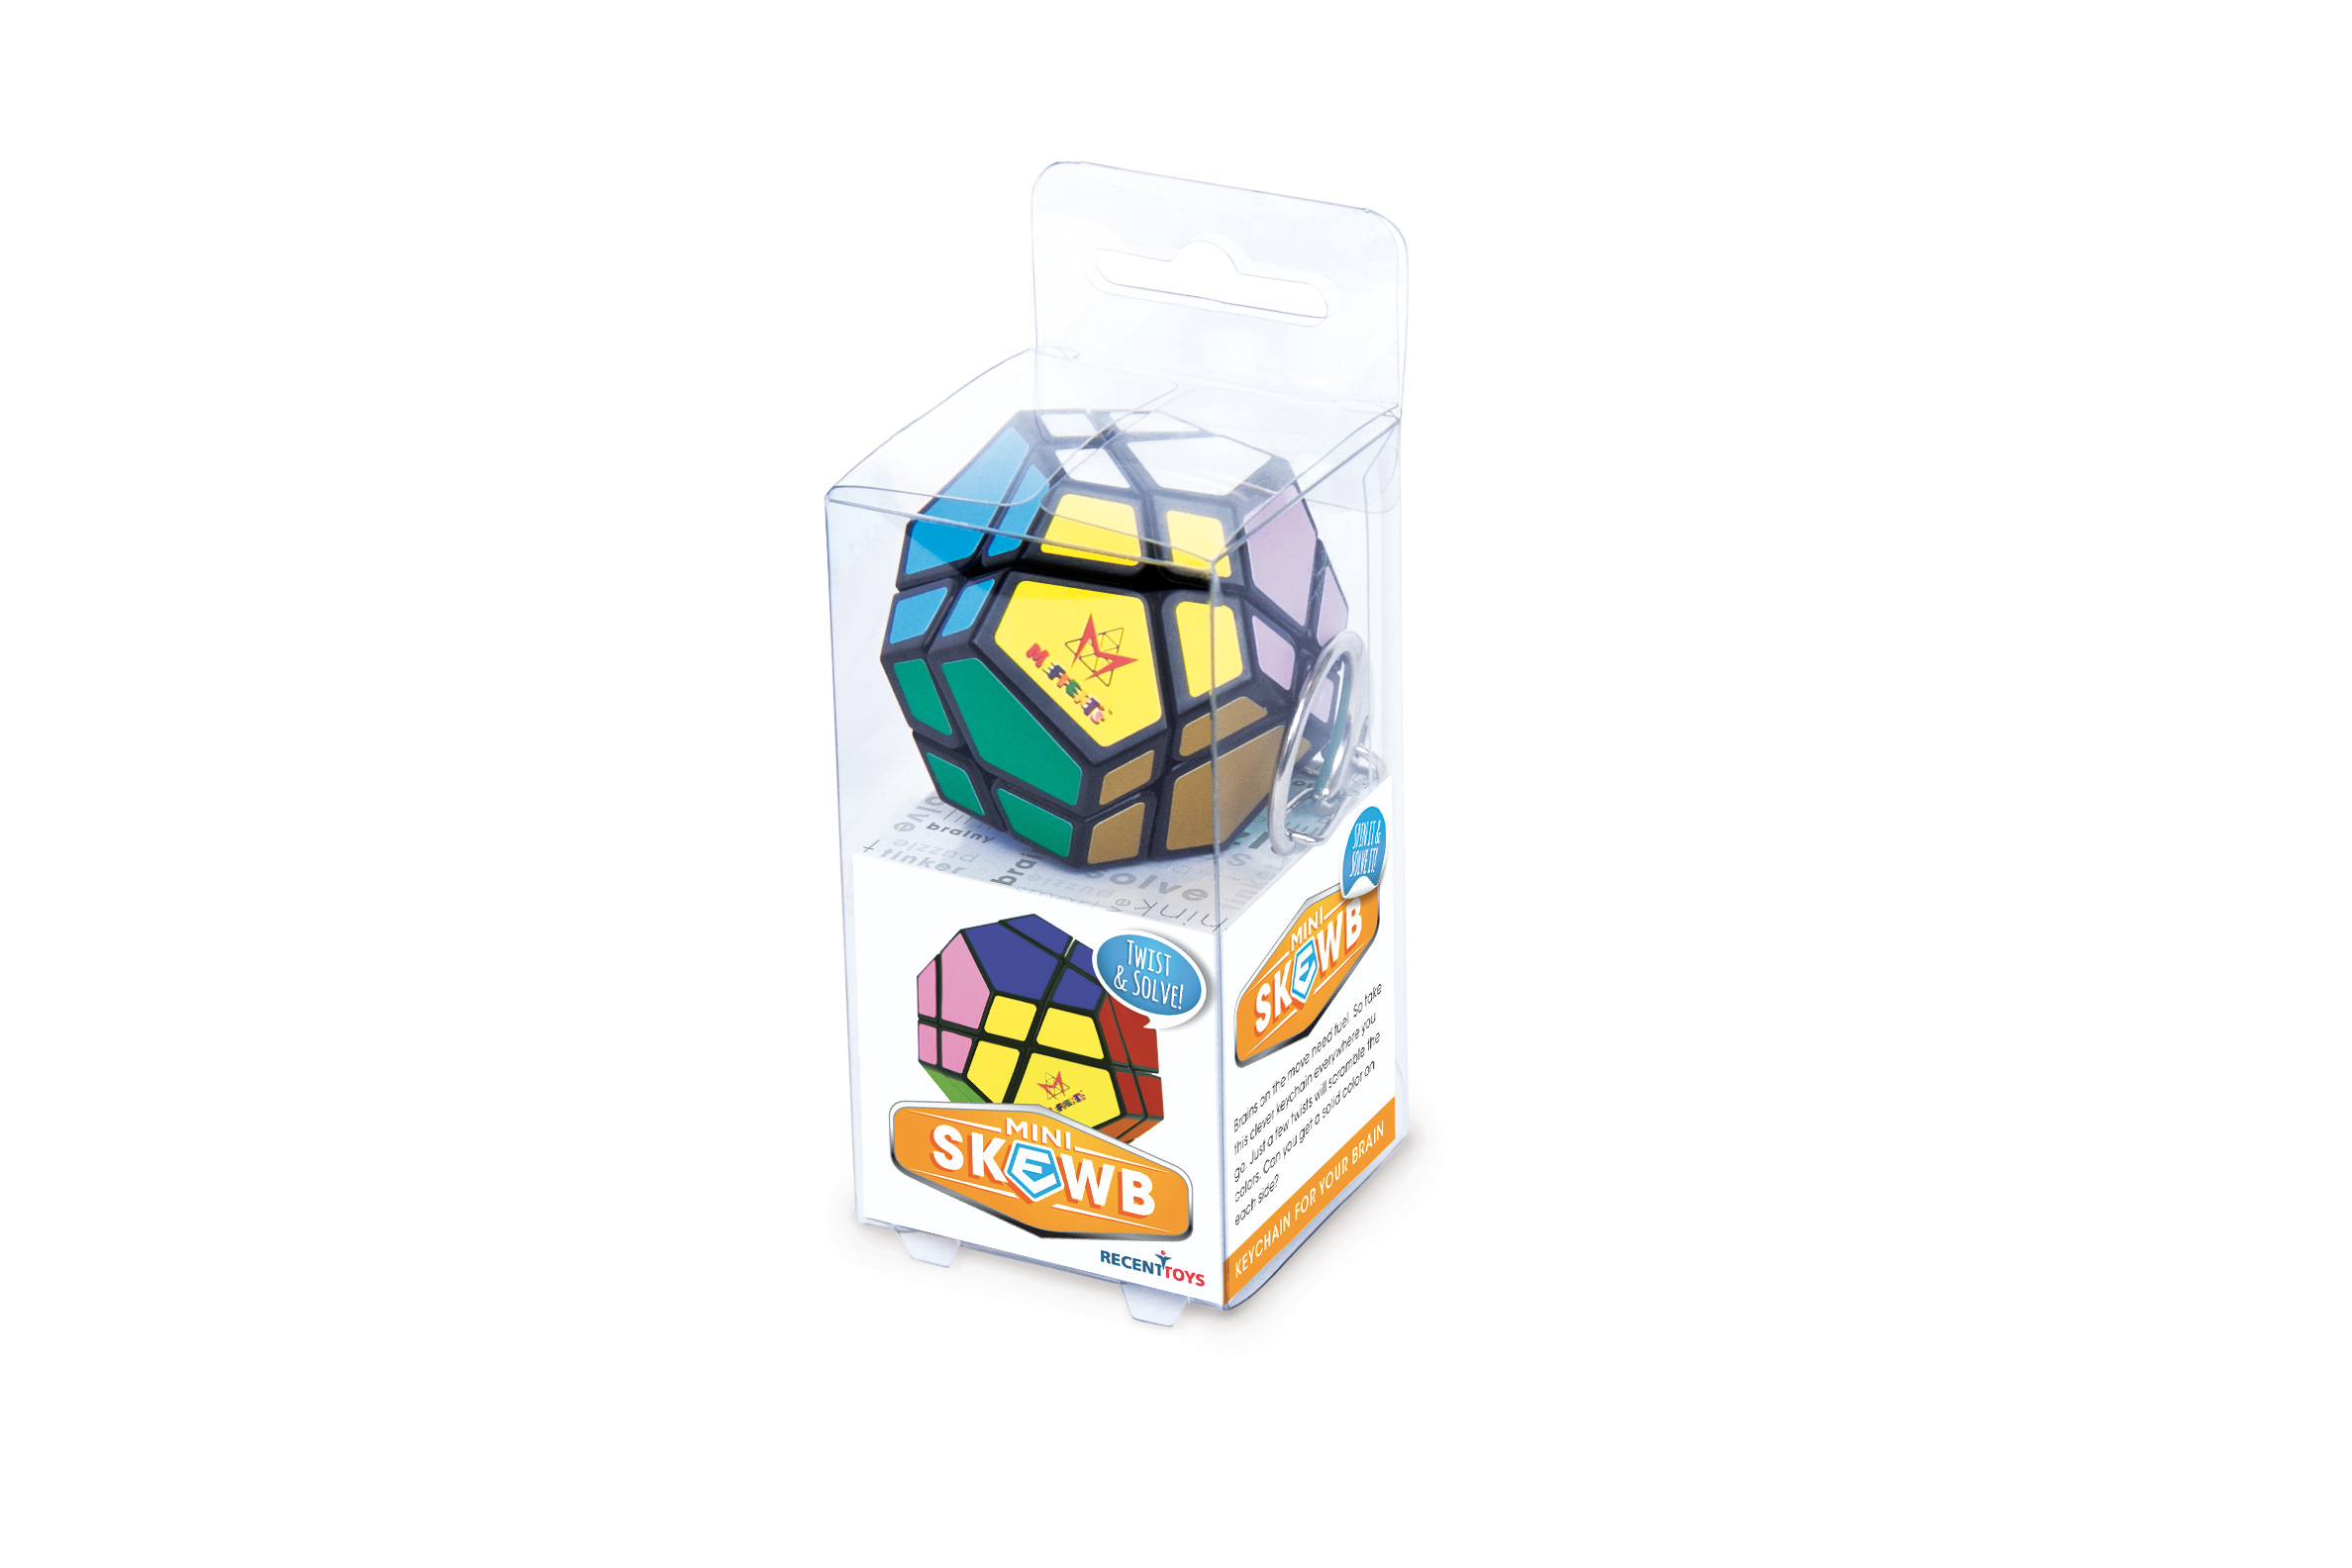 Casse-têtes - Mini skewb --Riviera Games